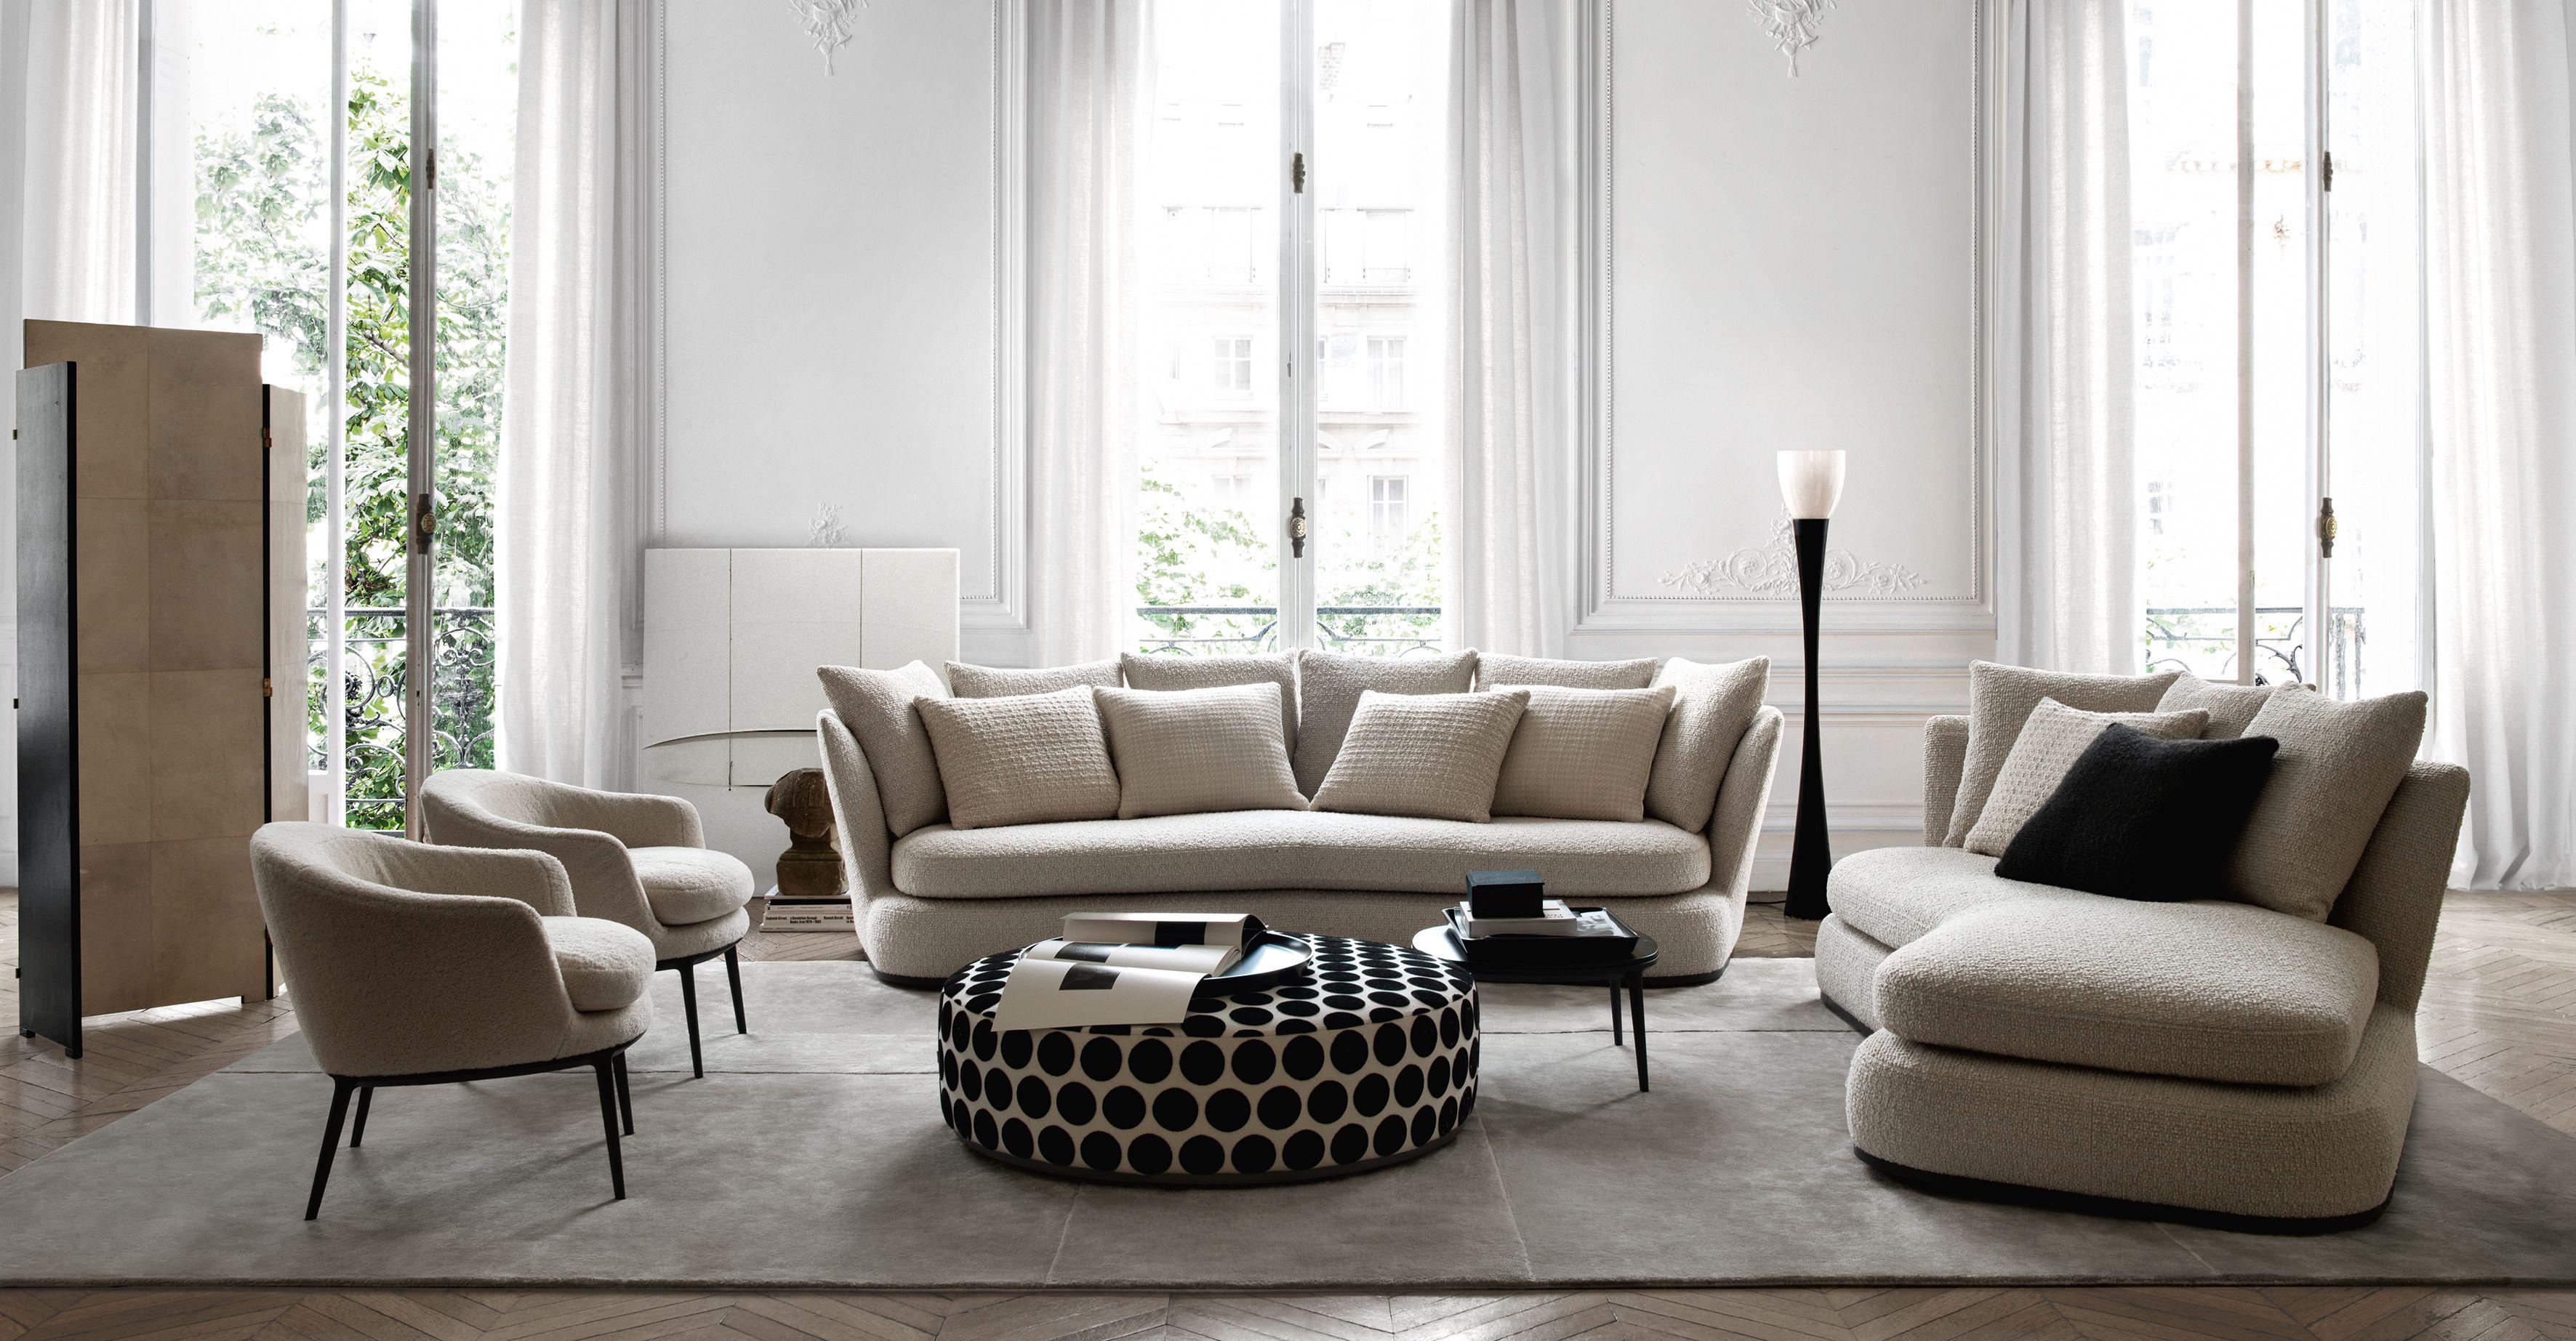 Maxalto Timeless Elegance Italian Sofa Designs Sofa Design Furniture Design